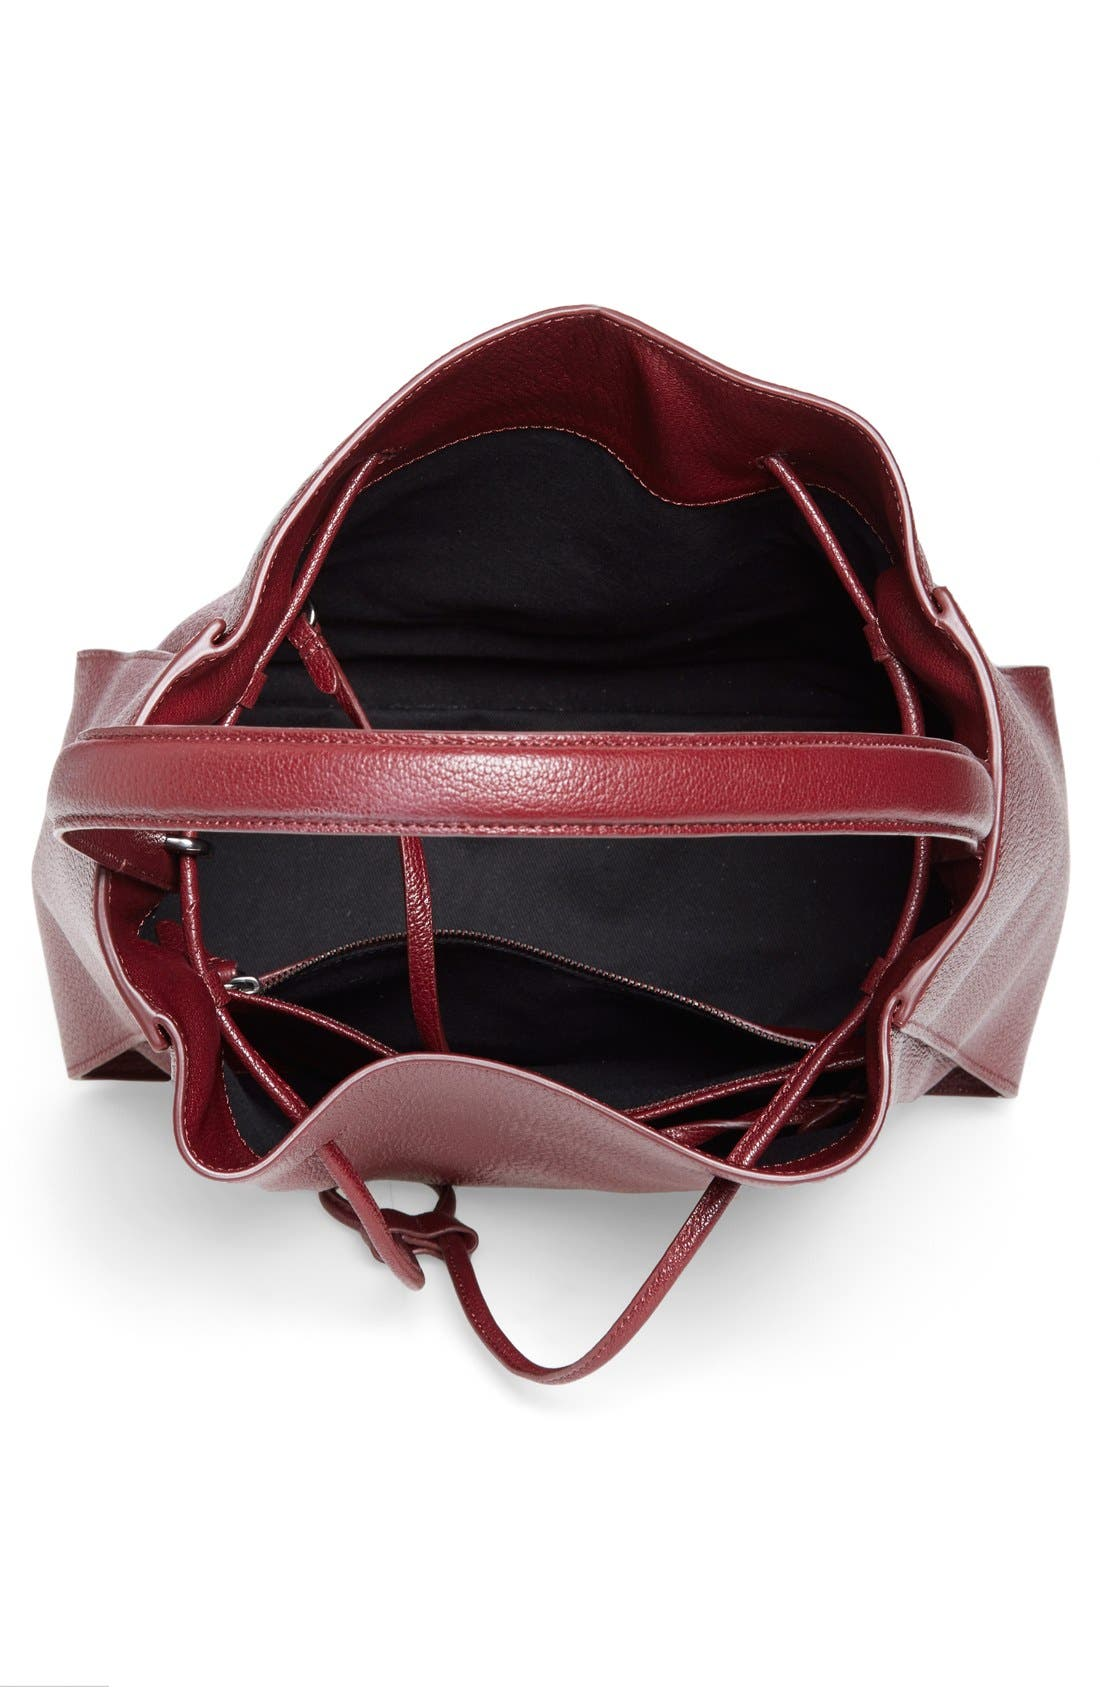 'Large Soleil' Leather Bucket Bag,                             Alternate thumbnail 12, color,